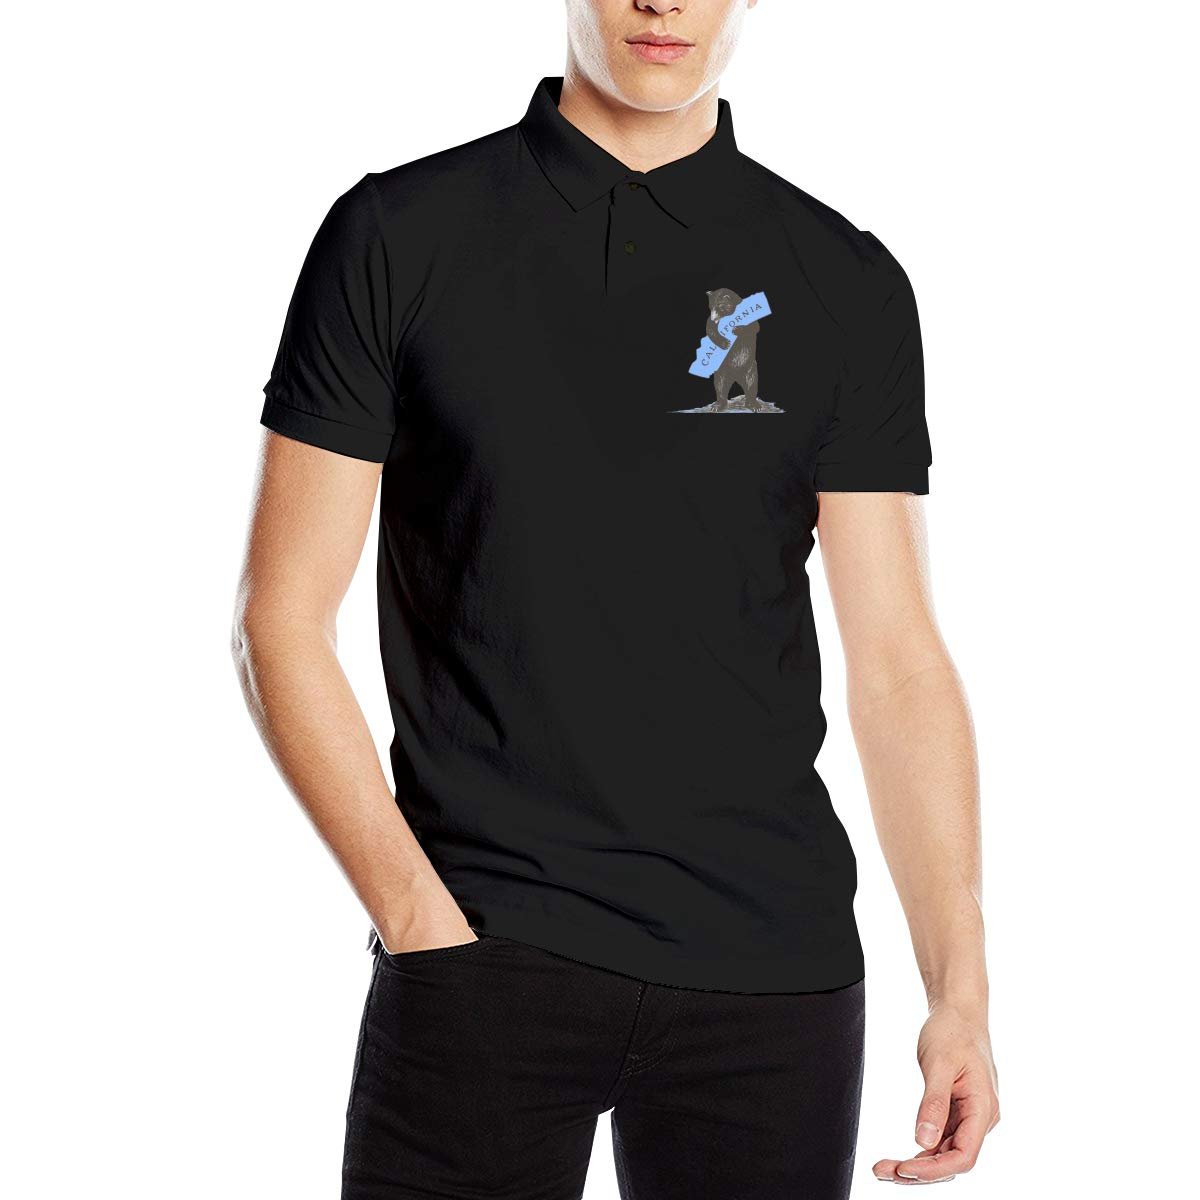 Cjlrqone California Mens Funny Polo Shirts Black